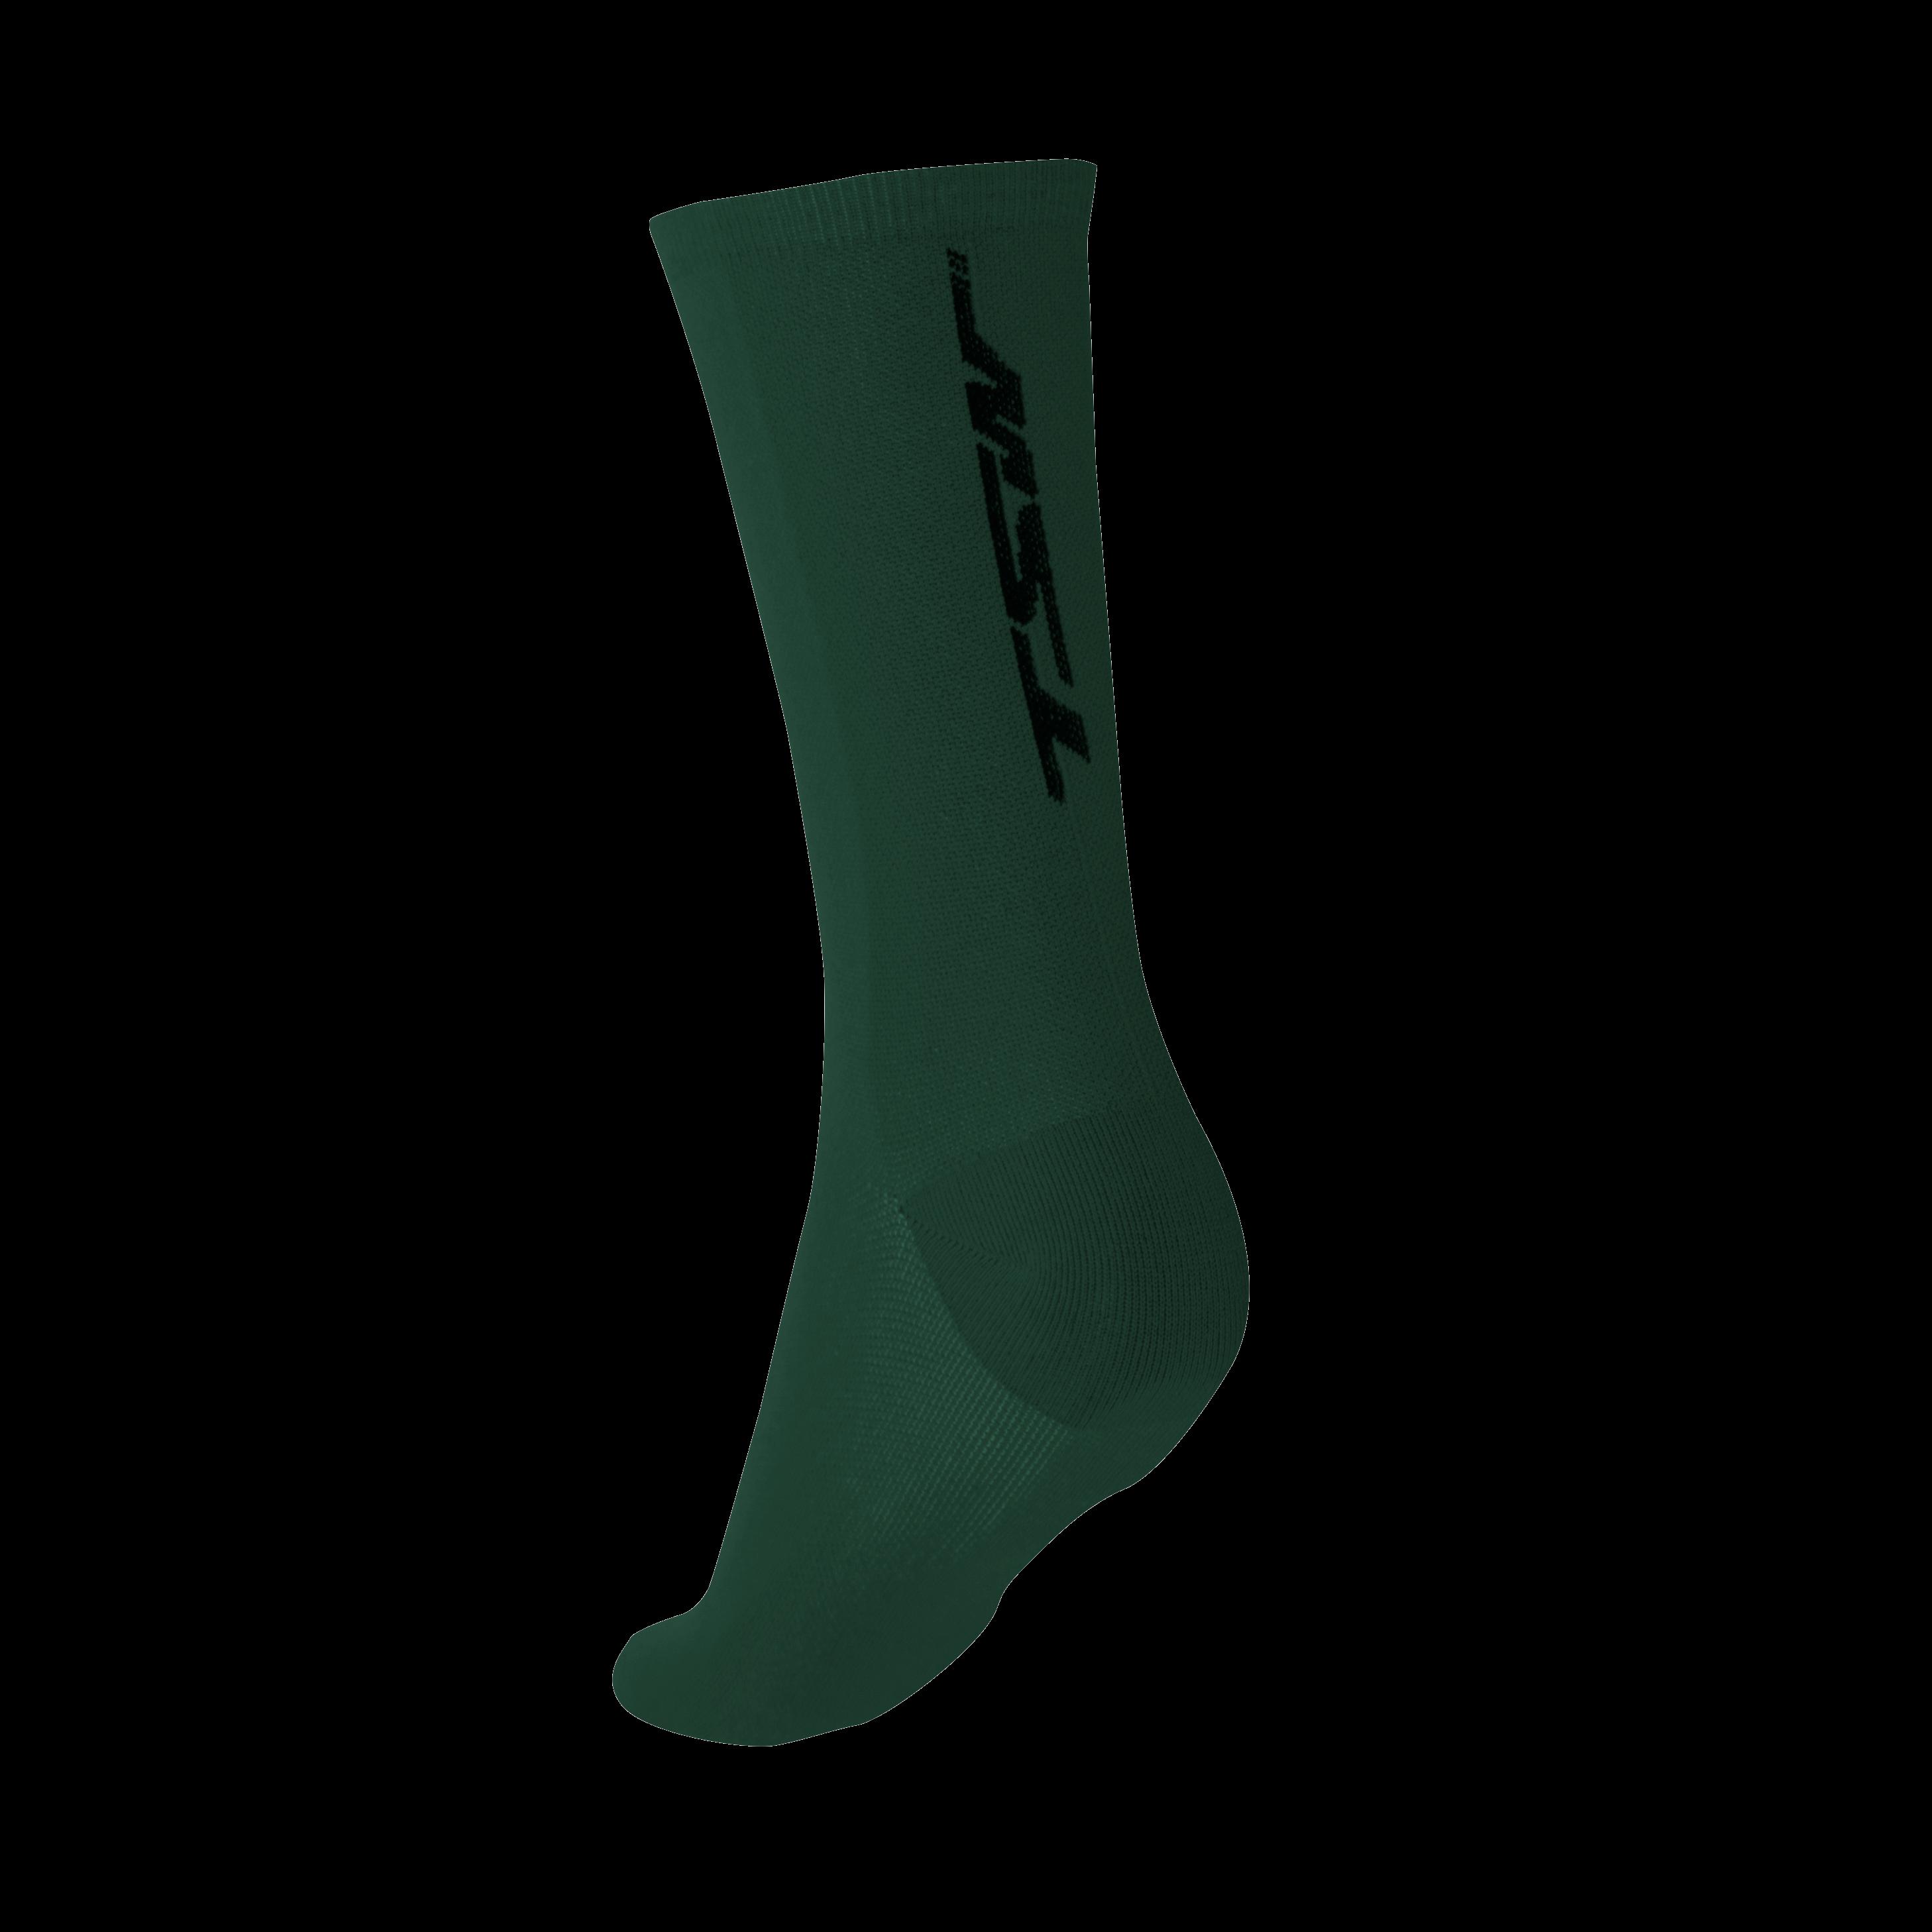 10651-meia-verde-back